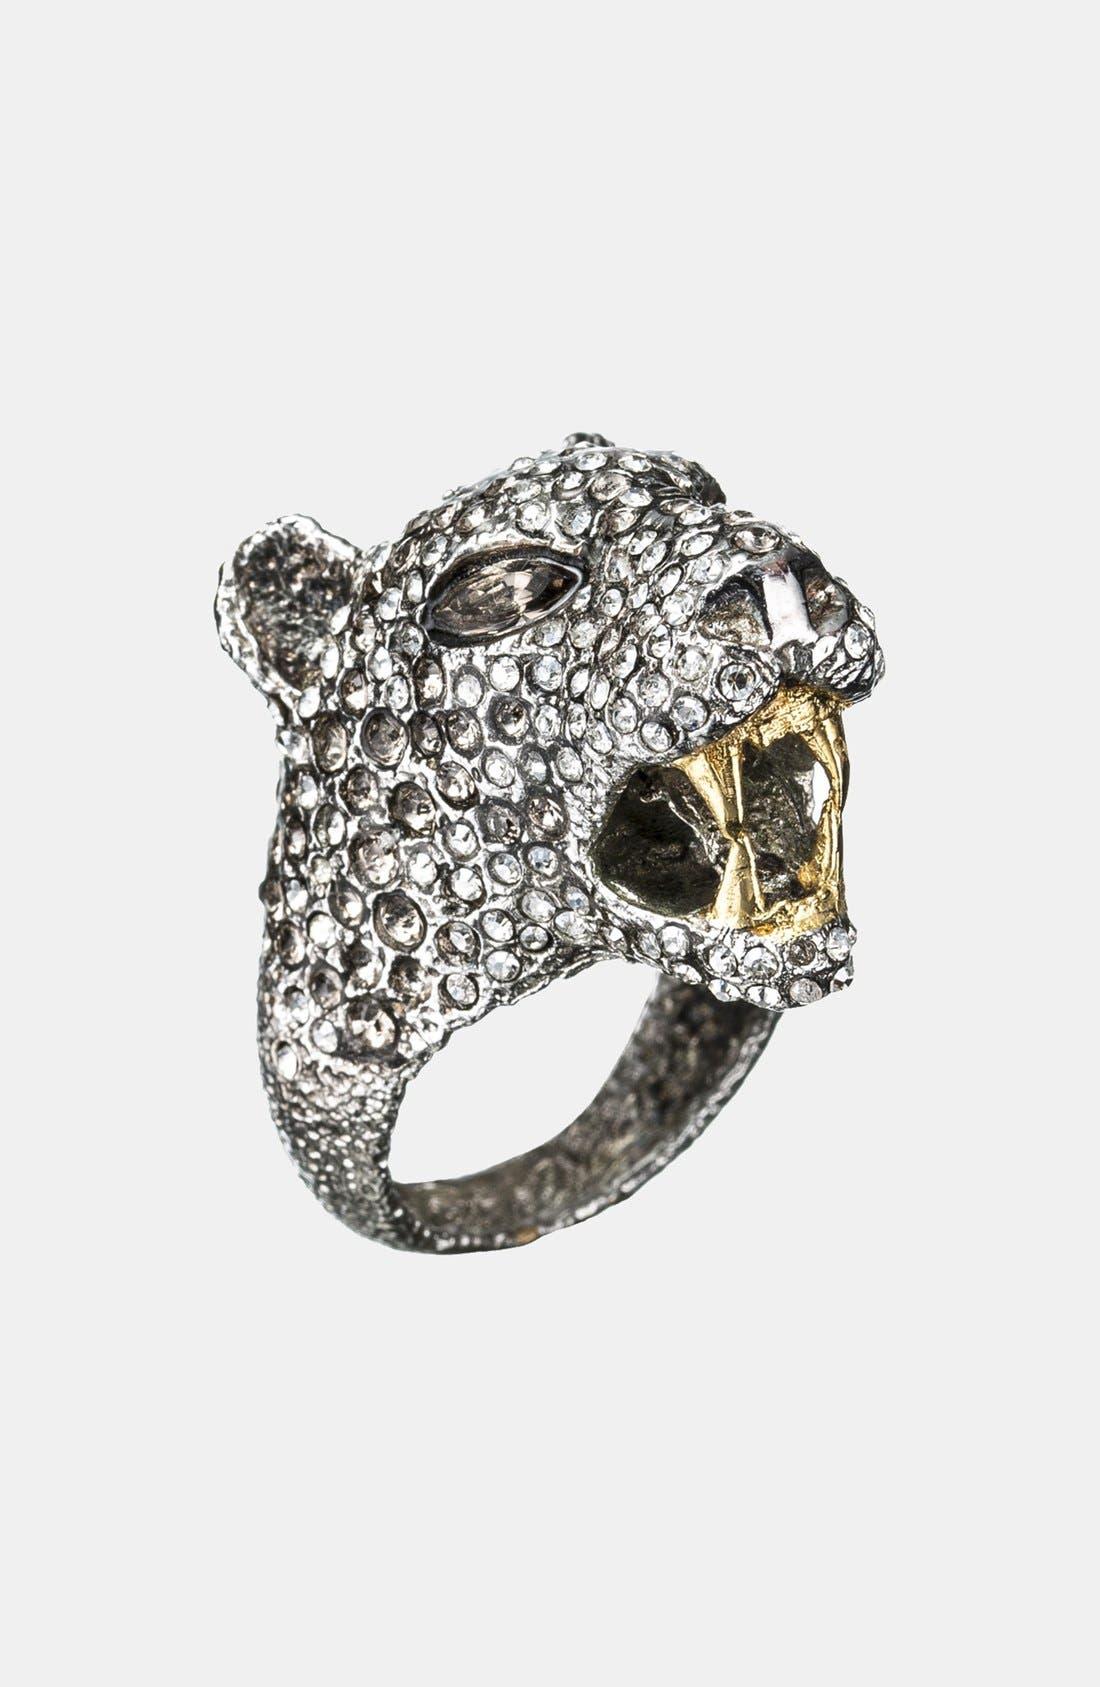 Main Image - Alexis Bittar 'Elements - Cordova' Jaguar Cocktail Ring